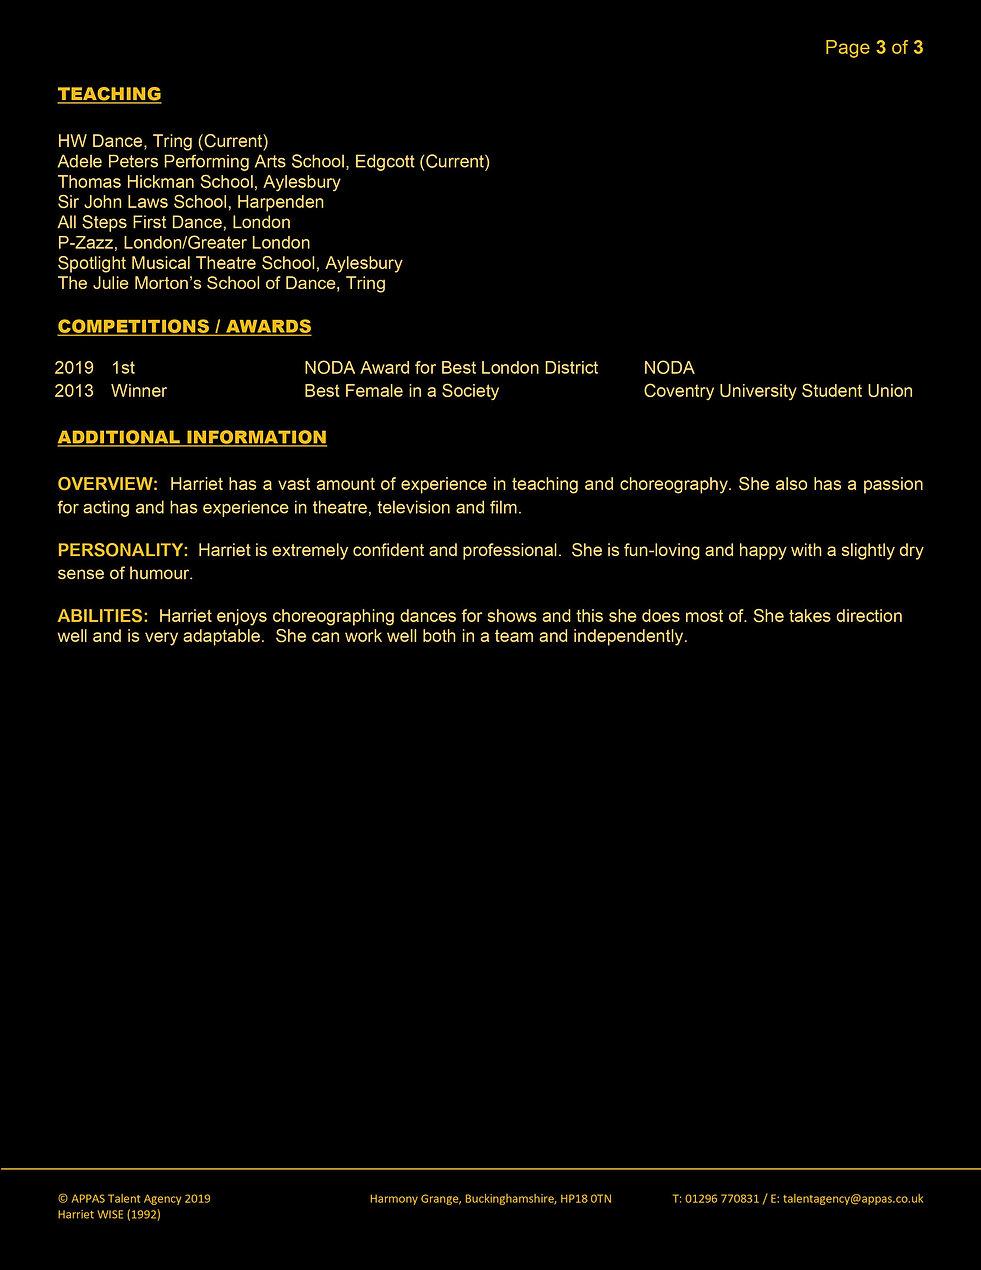 HARRIET WISE WEB CV (MAR 2020) 3.jpg